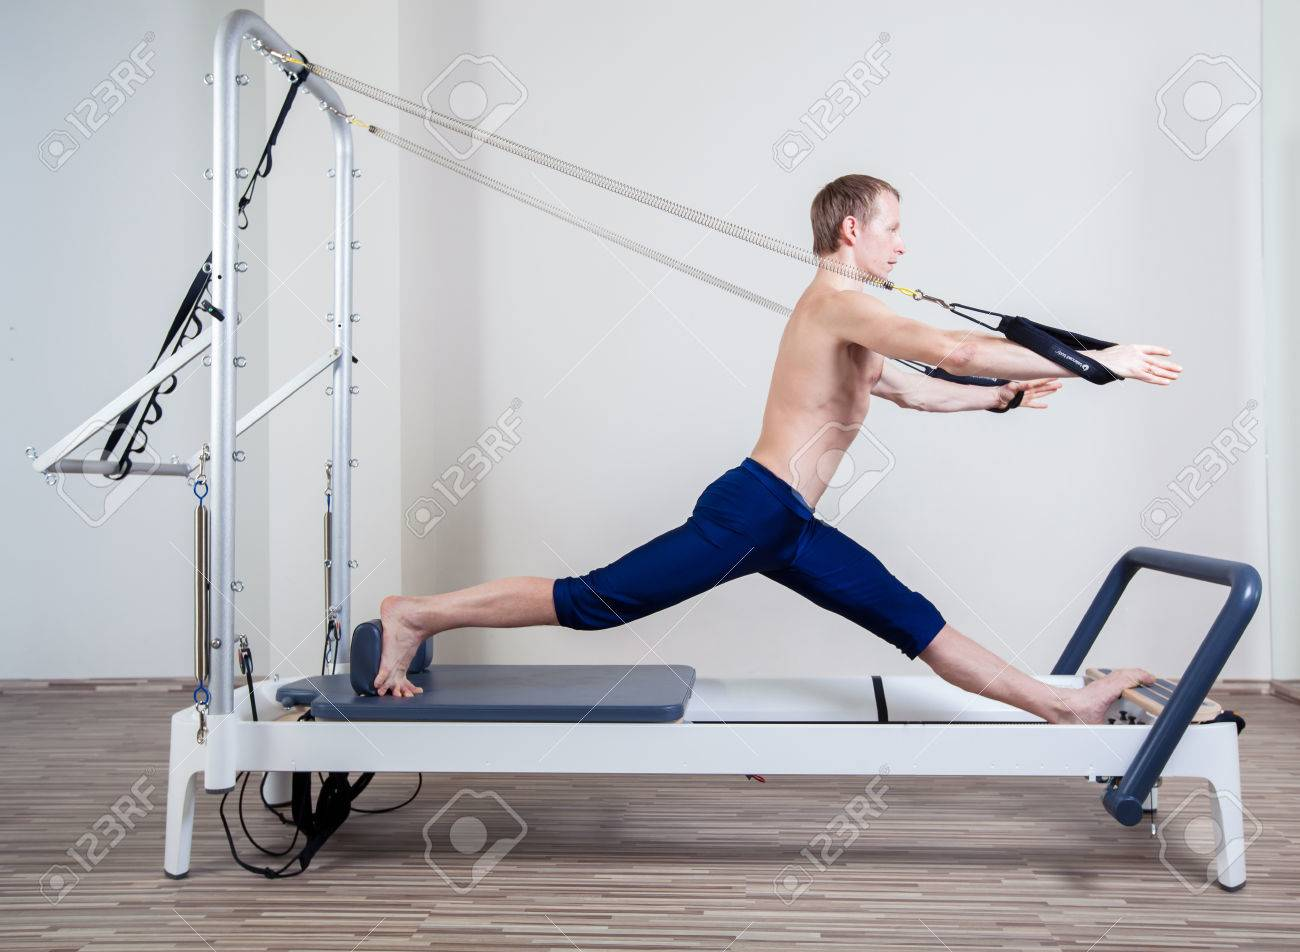 Pilates reformer workout exercises man at gym indoor - 40299167